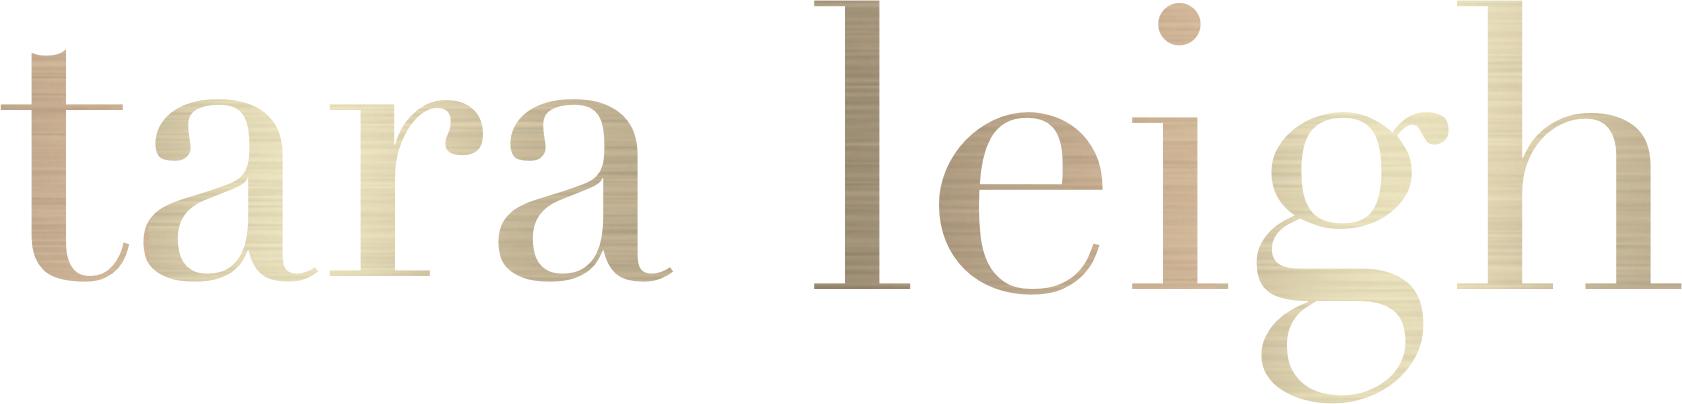 TaraLeigh_Logo_Final.jpg